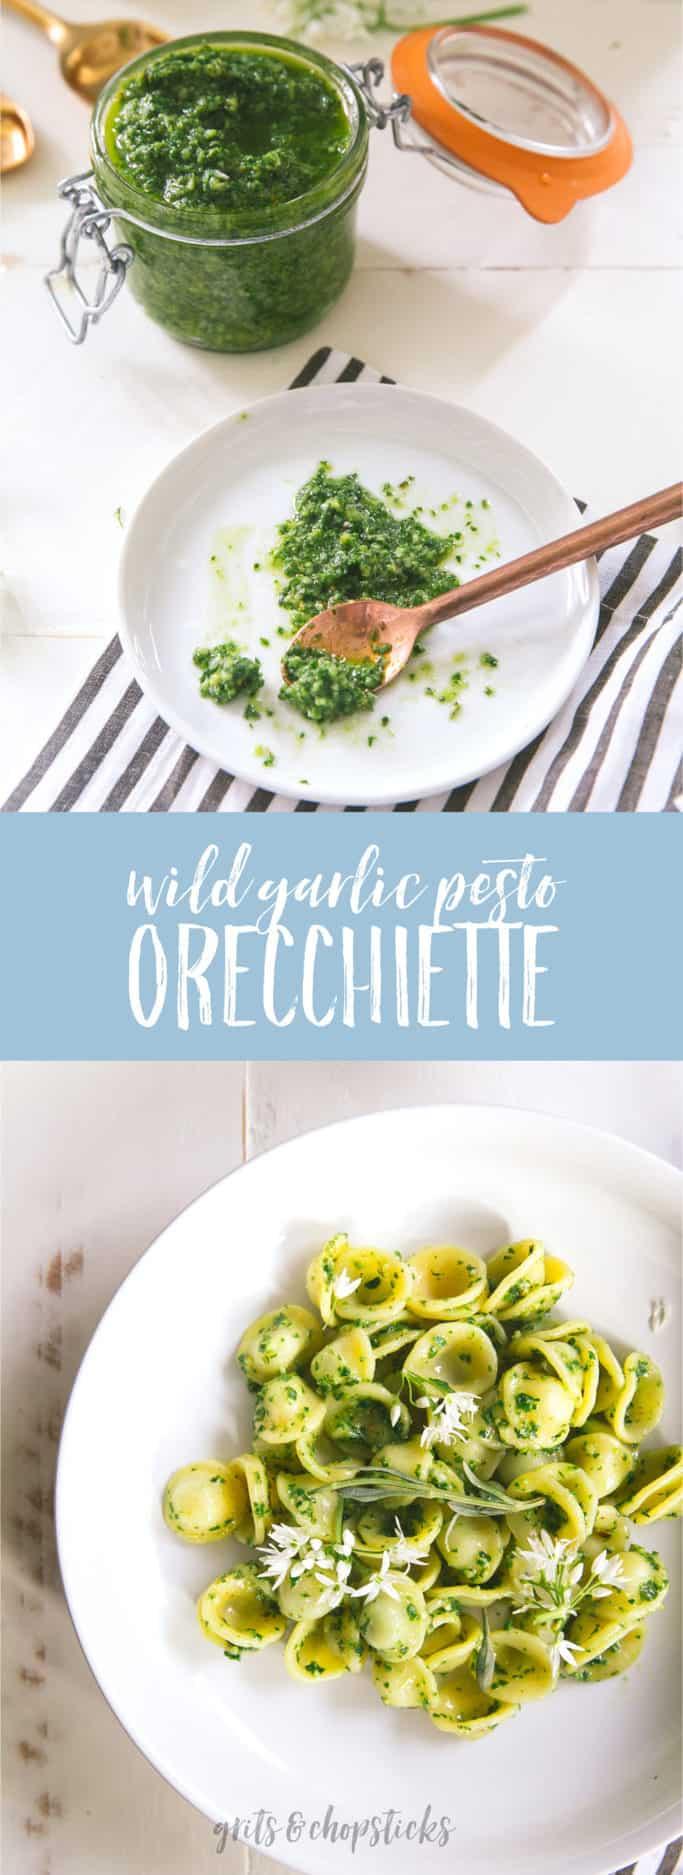 Use seasonal spring ingredients to make this wild garlic pesto orecchiette (or use ramps if you can't find wild garlic)